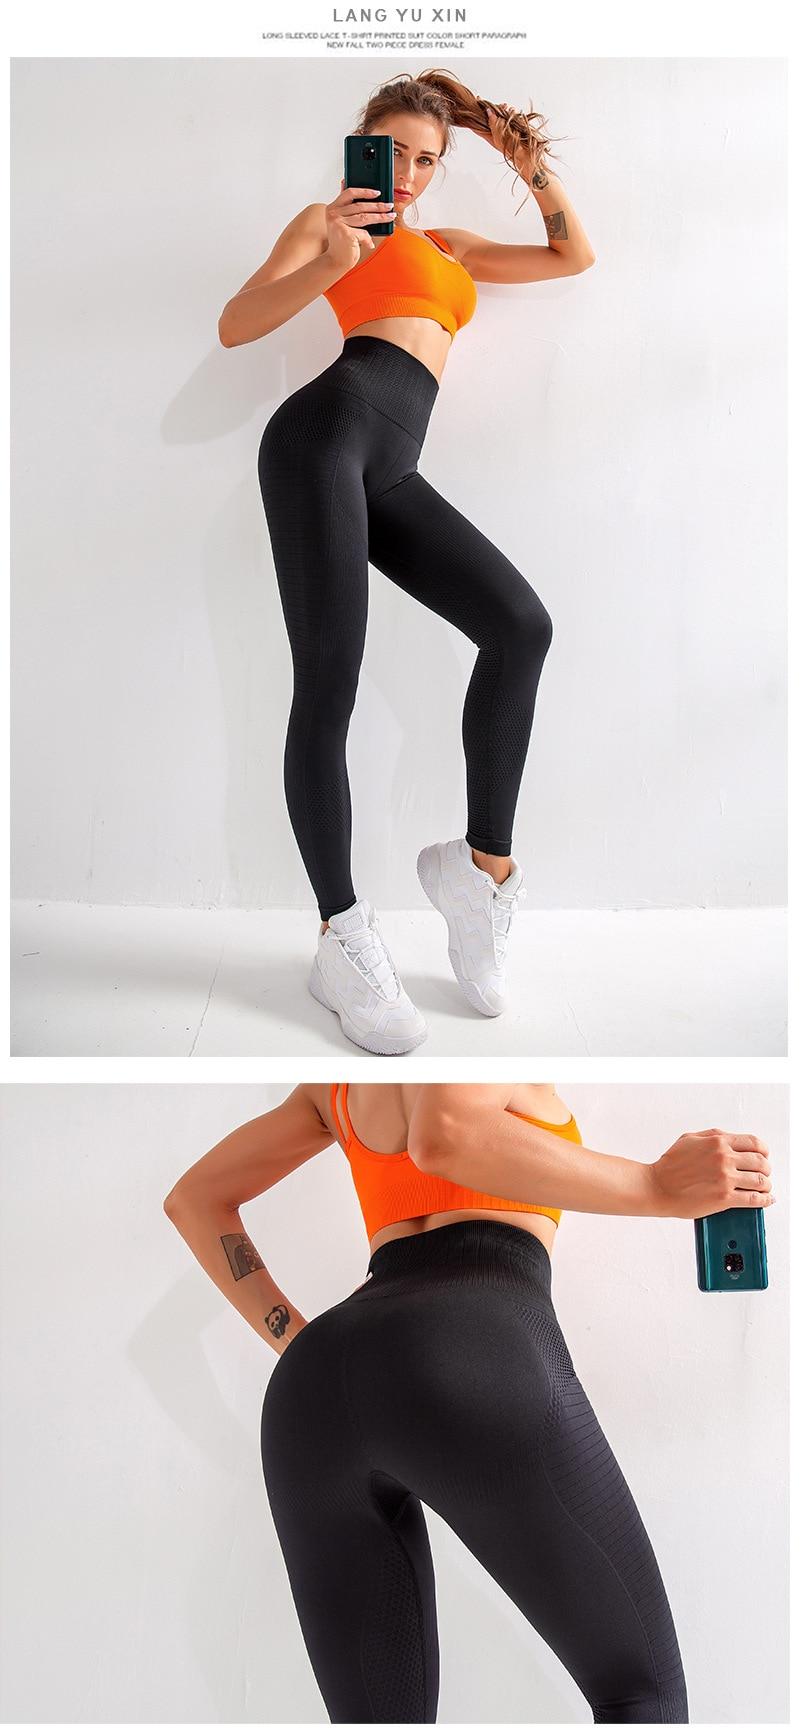 spor tayt,yüksek bel tayt,yoga tayt,spor tayt takım,kadın spor tayt,yüksek bel tayt